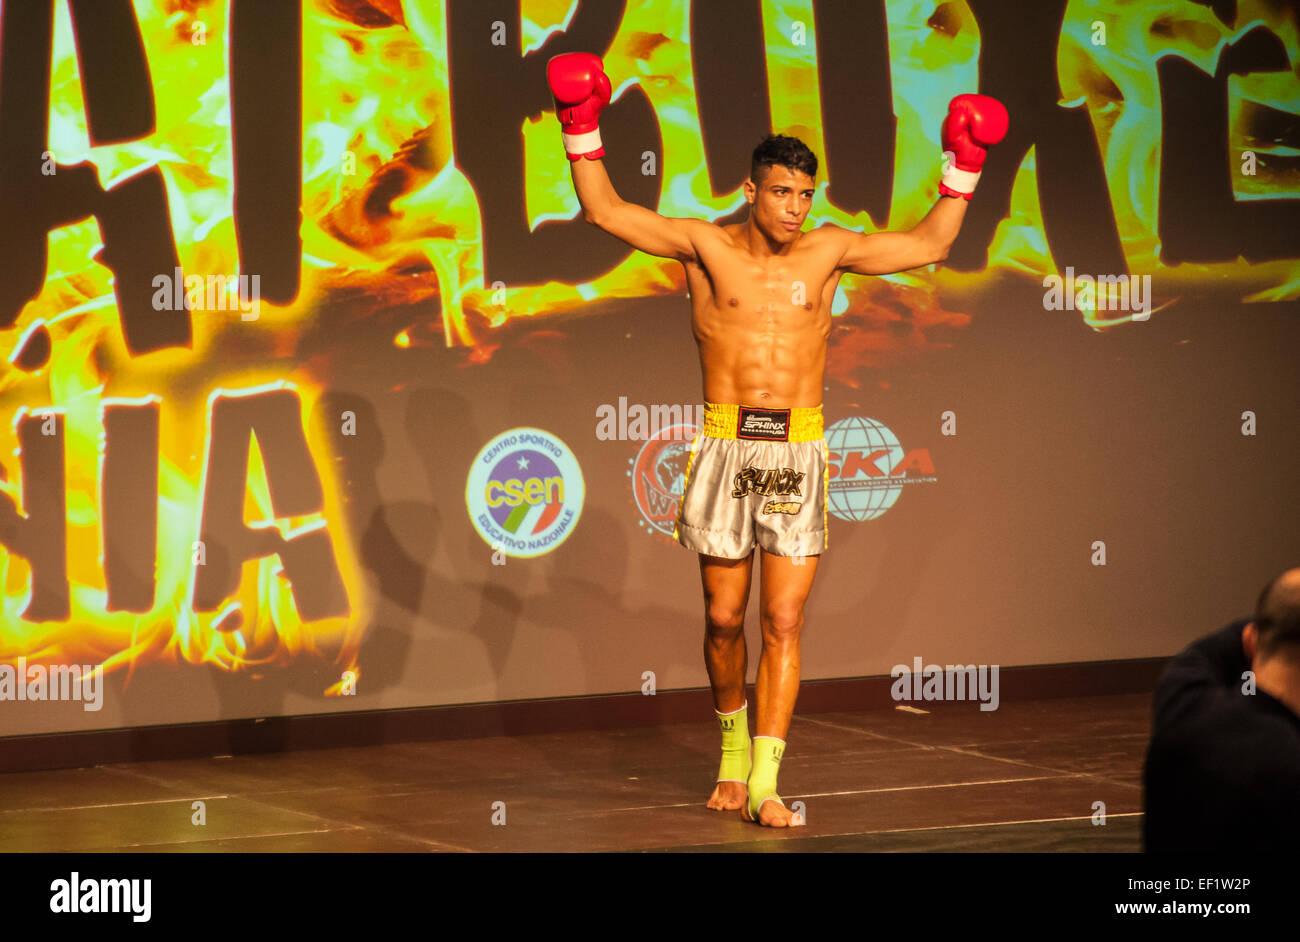 Torino, Italy. 24th January, 2015. Thai Box Mania _ Prestige Pre Card - Alkid Farruku  Albania VS Ismail Zahir Morocco - Stock Image